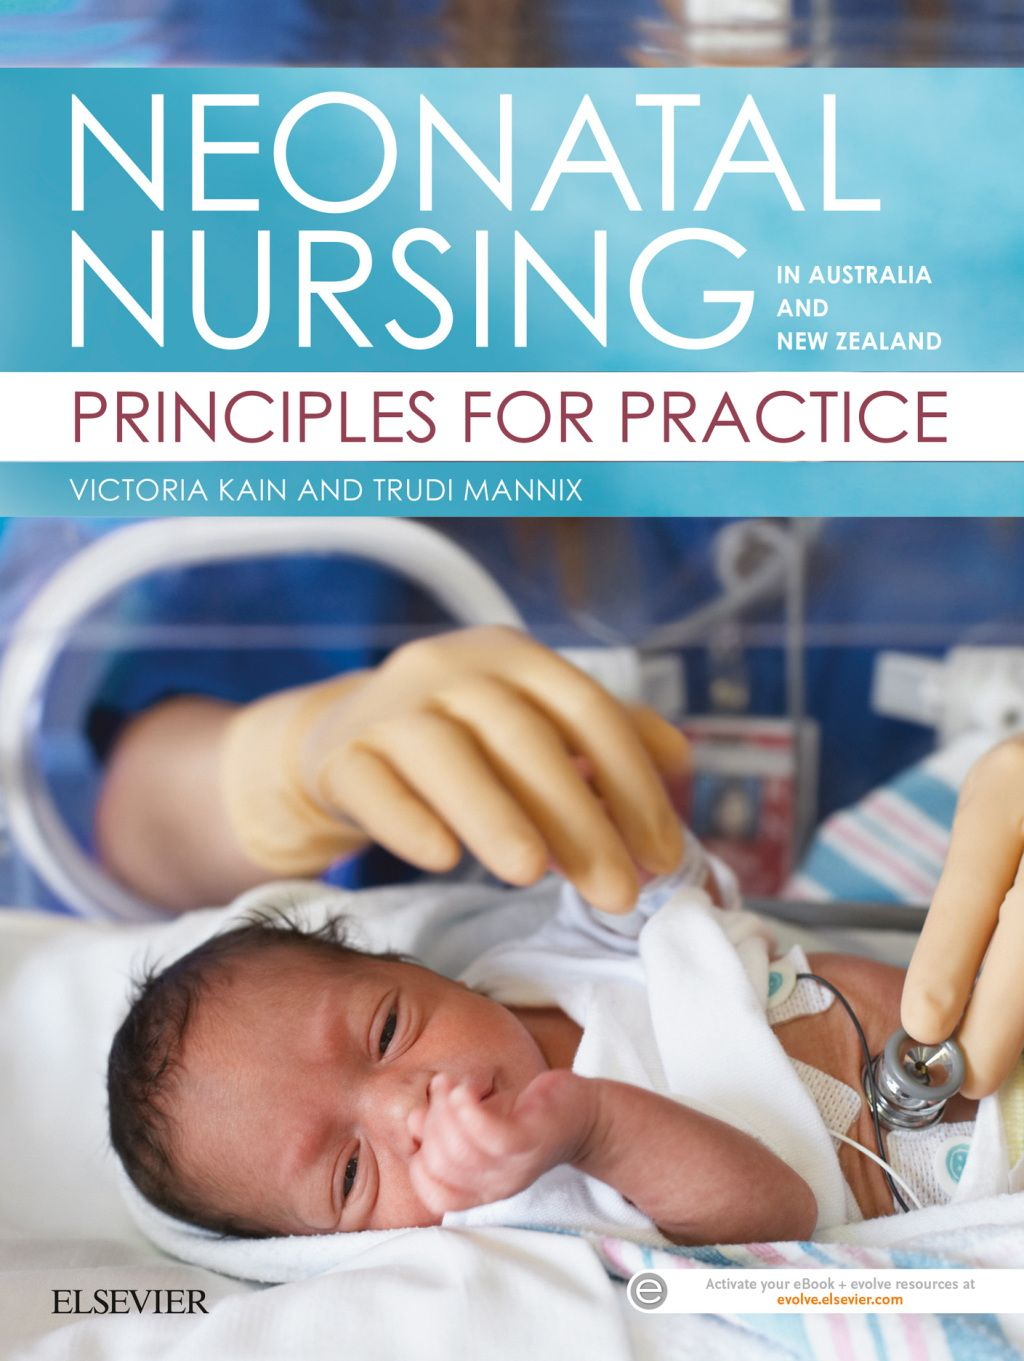 Neonatal Nursing in Australia and New Zealand (eBook